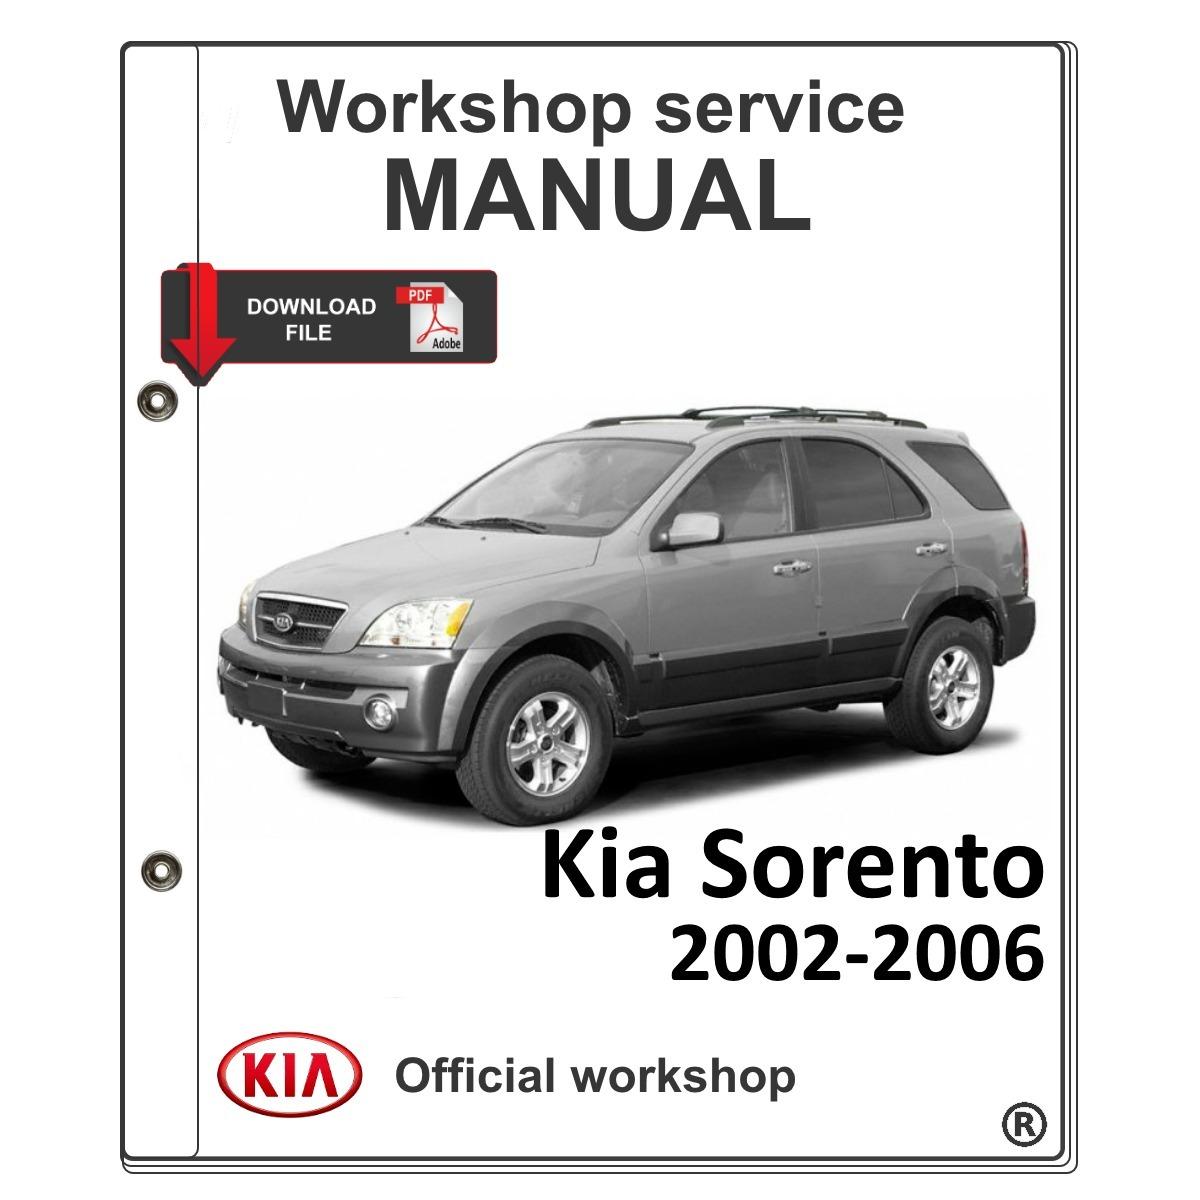 kia sorento 2002 2006 manual de taller de servicio manual re s 30 rh articulo mercadolibre com pe manual de kia sorento 2003 manual de kia sorento 2004 en español